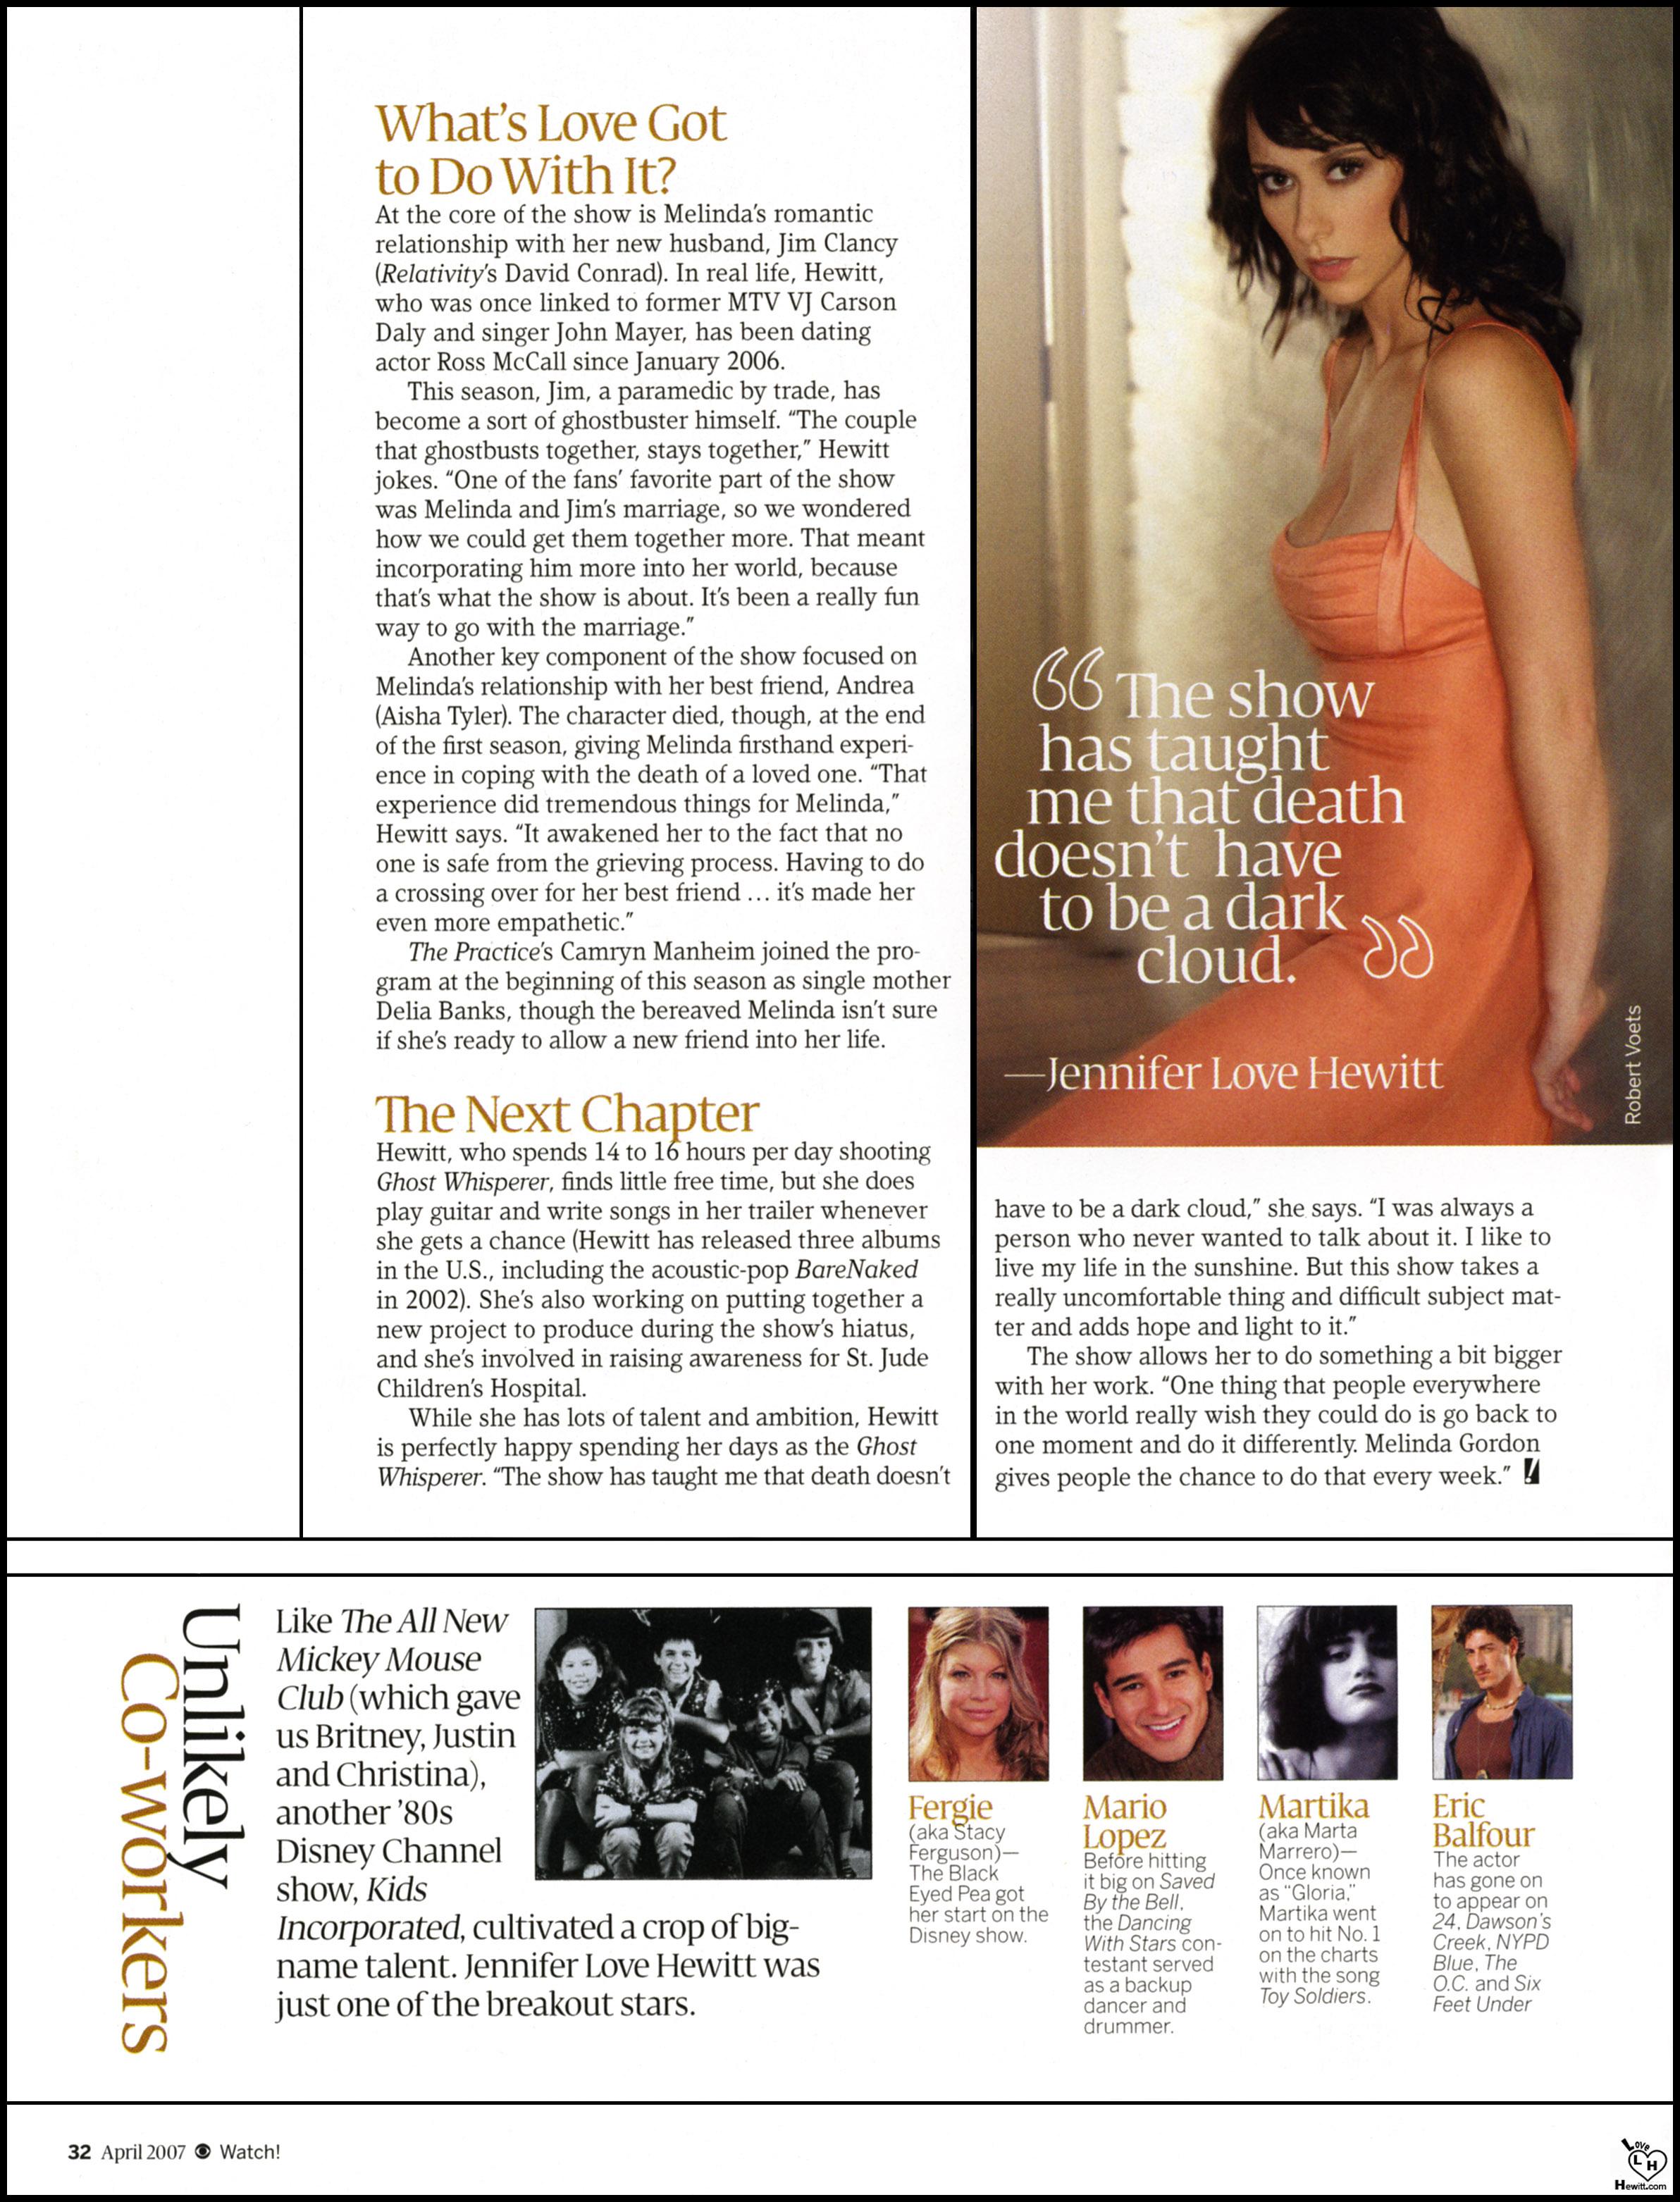 01747_Jennifer_Love_Hewitt_CBS_Watch_Magazine_April_2007_Page_6_122_25lo.jpg